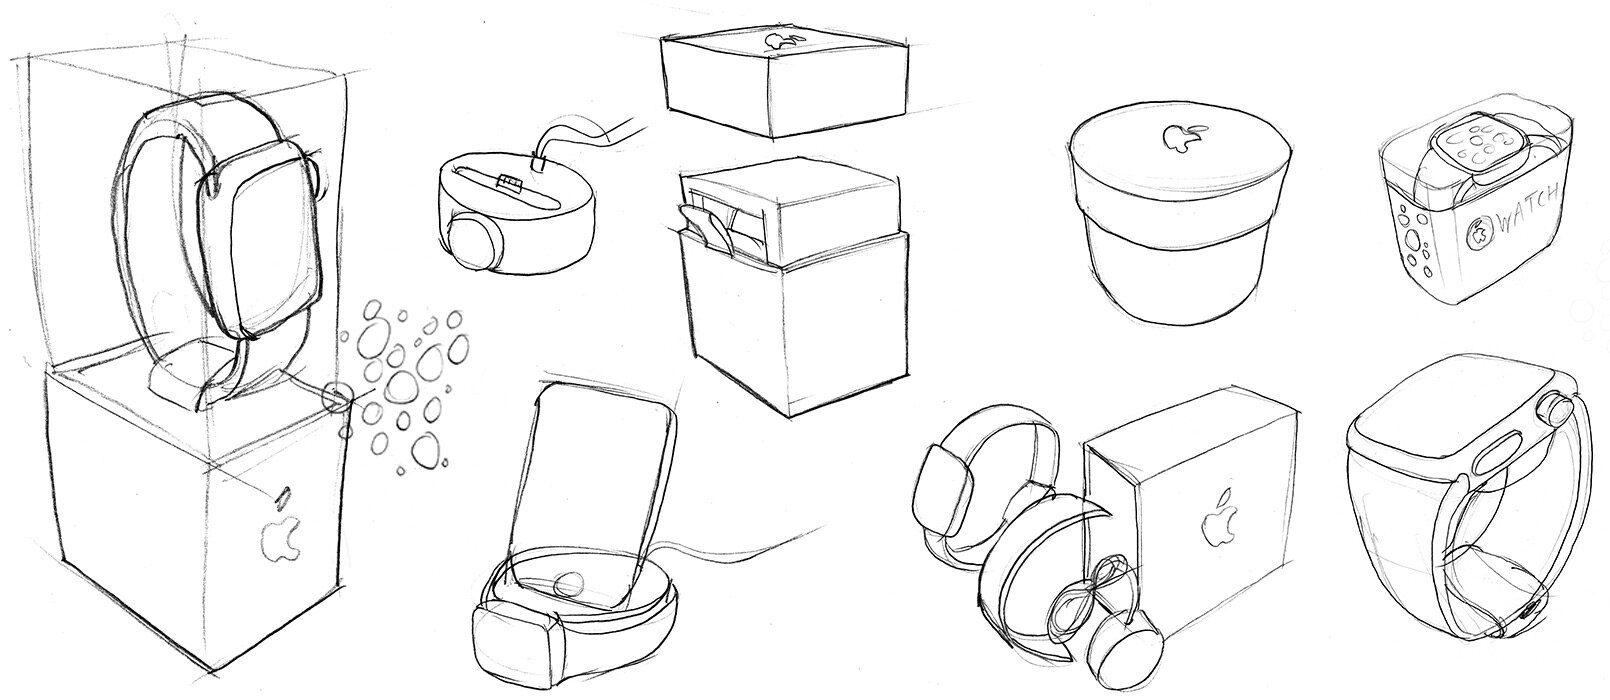 Apple-Watch-Smartwatch-Packaging-Design-Iwatch-Inseable-Technology-1.jpg